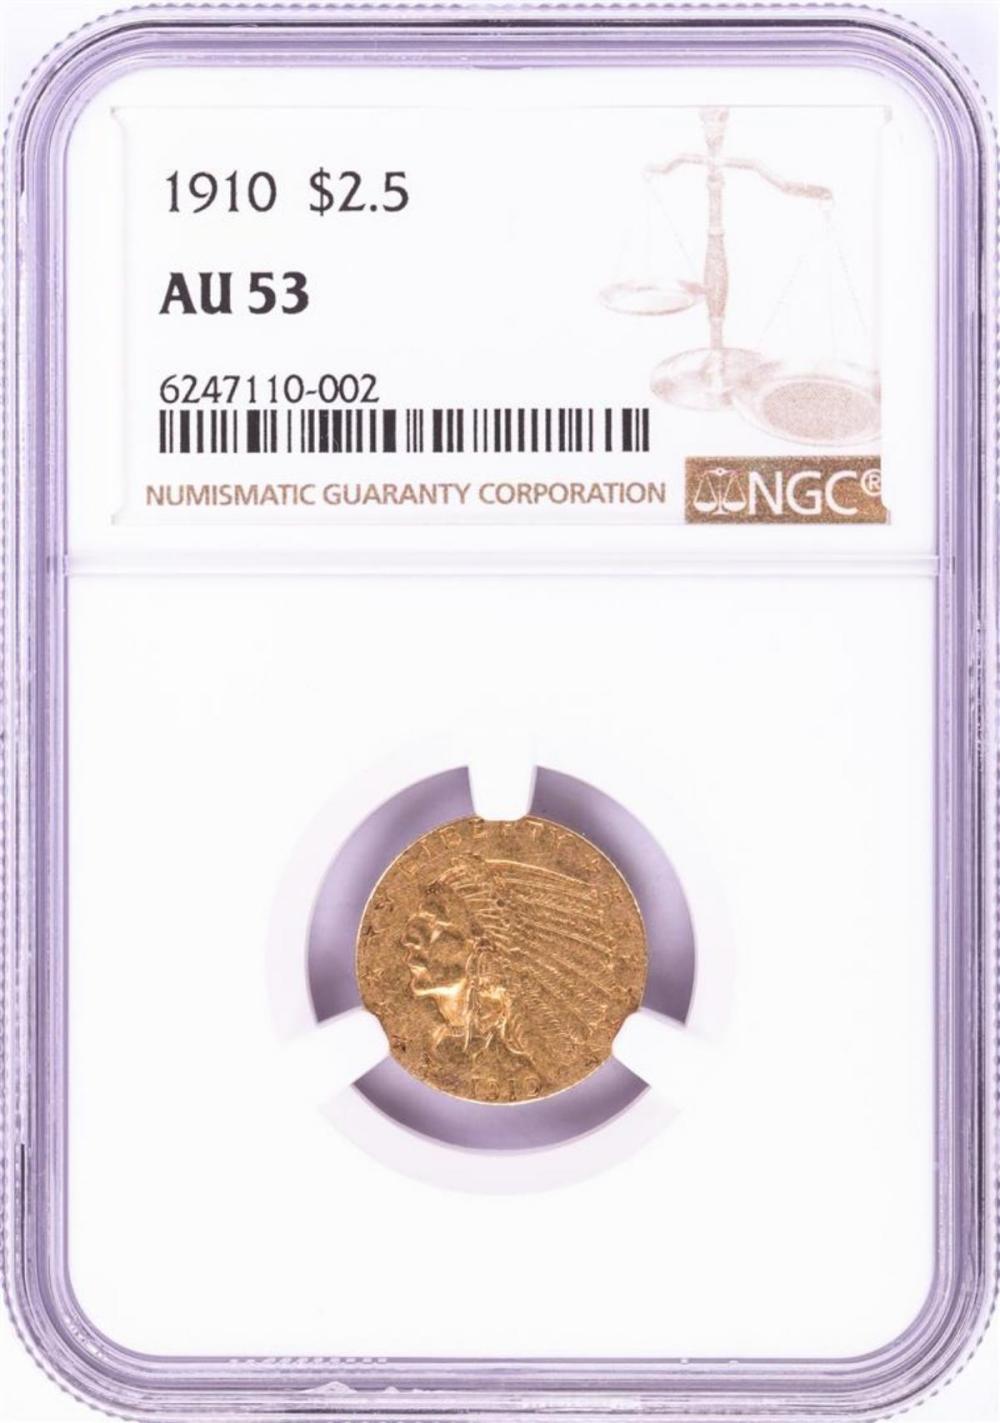 1910 $2 1/2 Indian Head Quarter Eagle Gold Coin NGC AU53